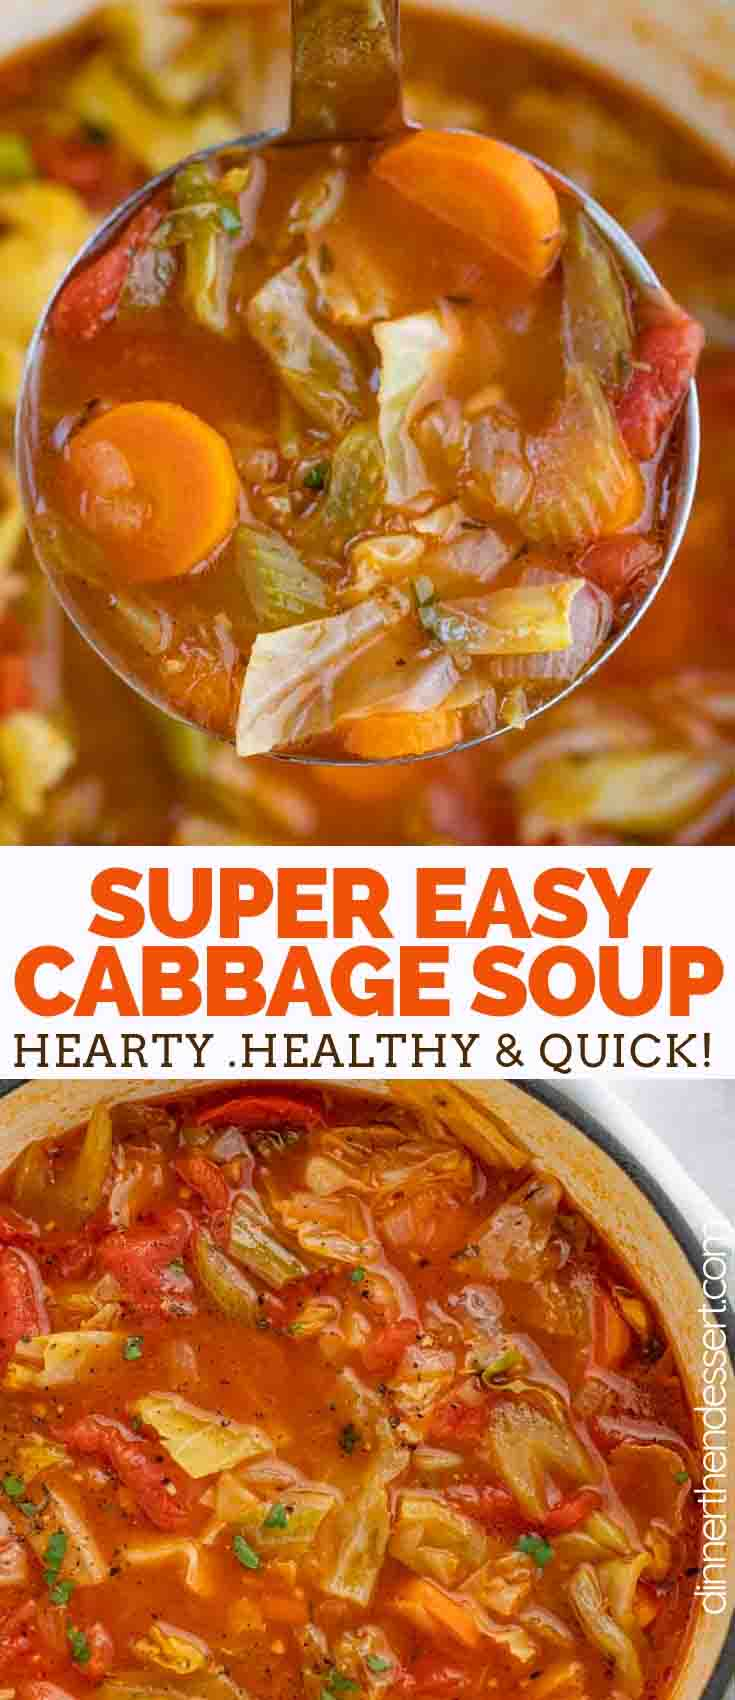 Cabbage Soup Dinner Then Dessert